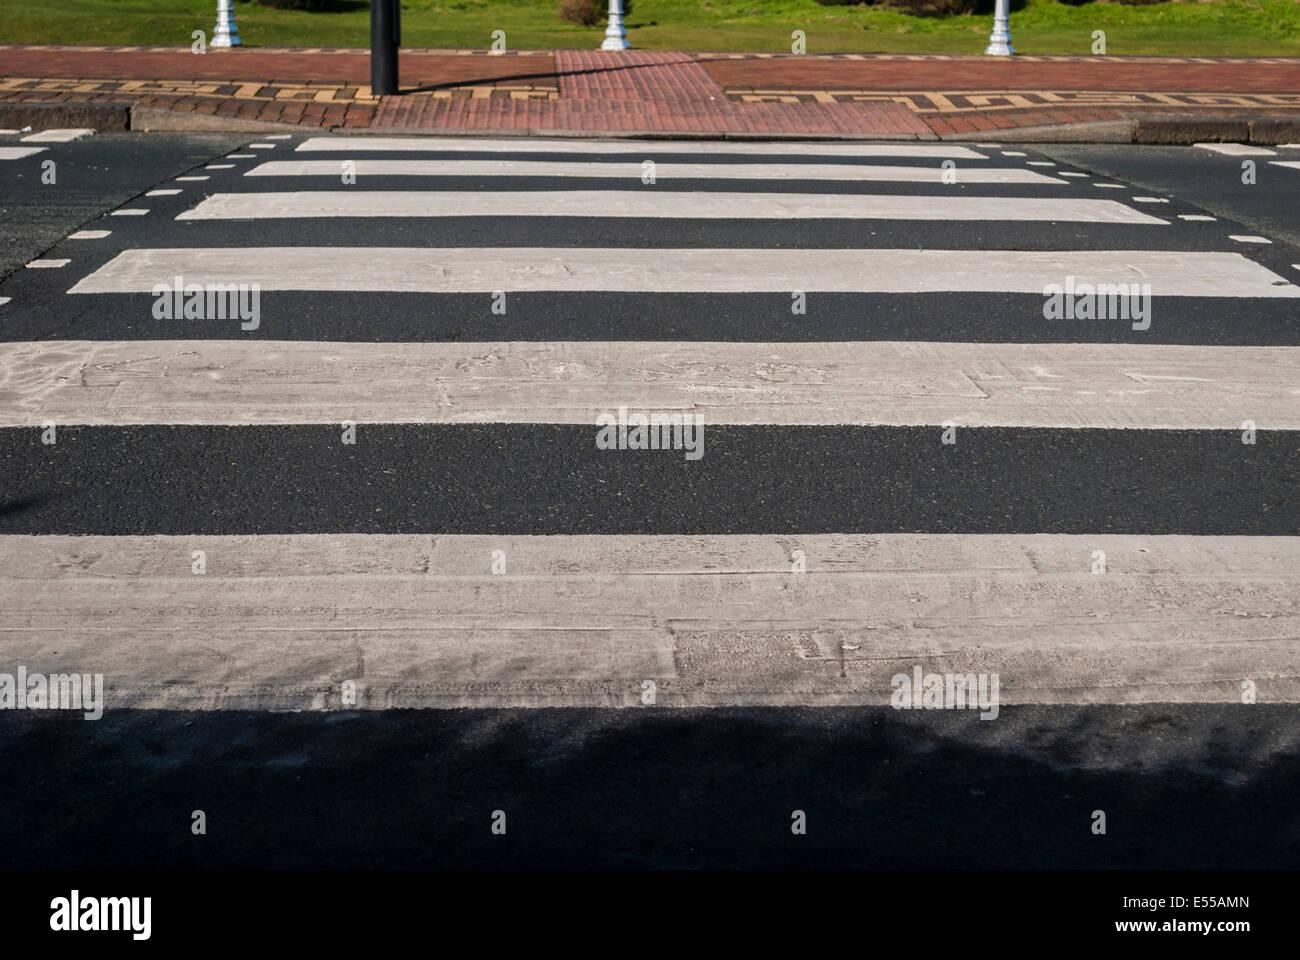 A Zebra/Pedestrian Crossing in England. - Stock Image